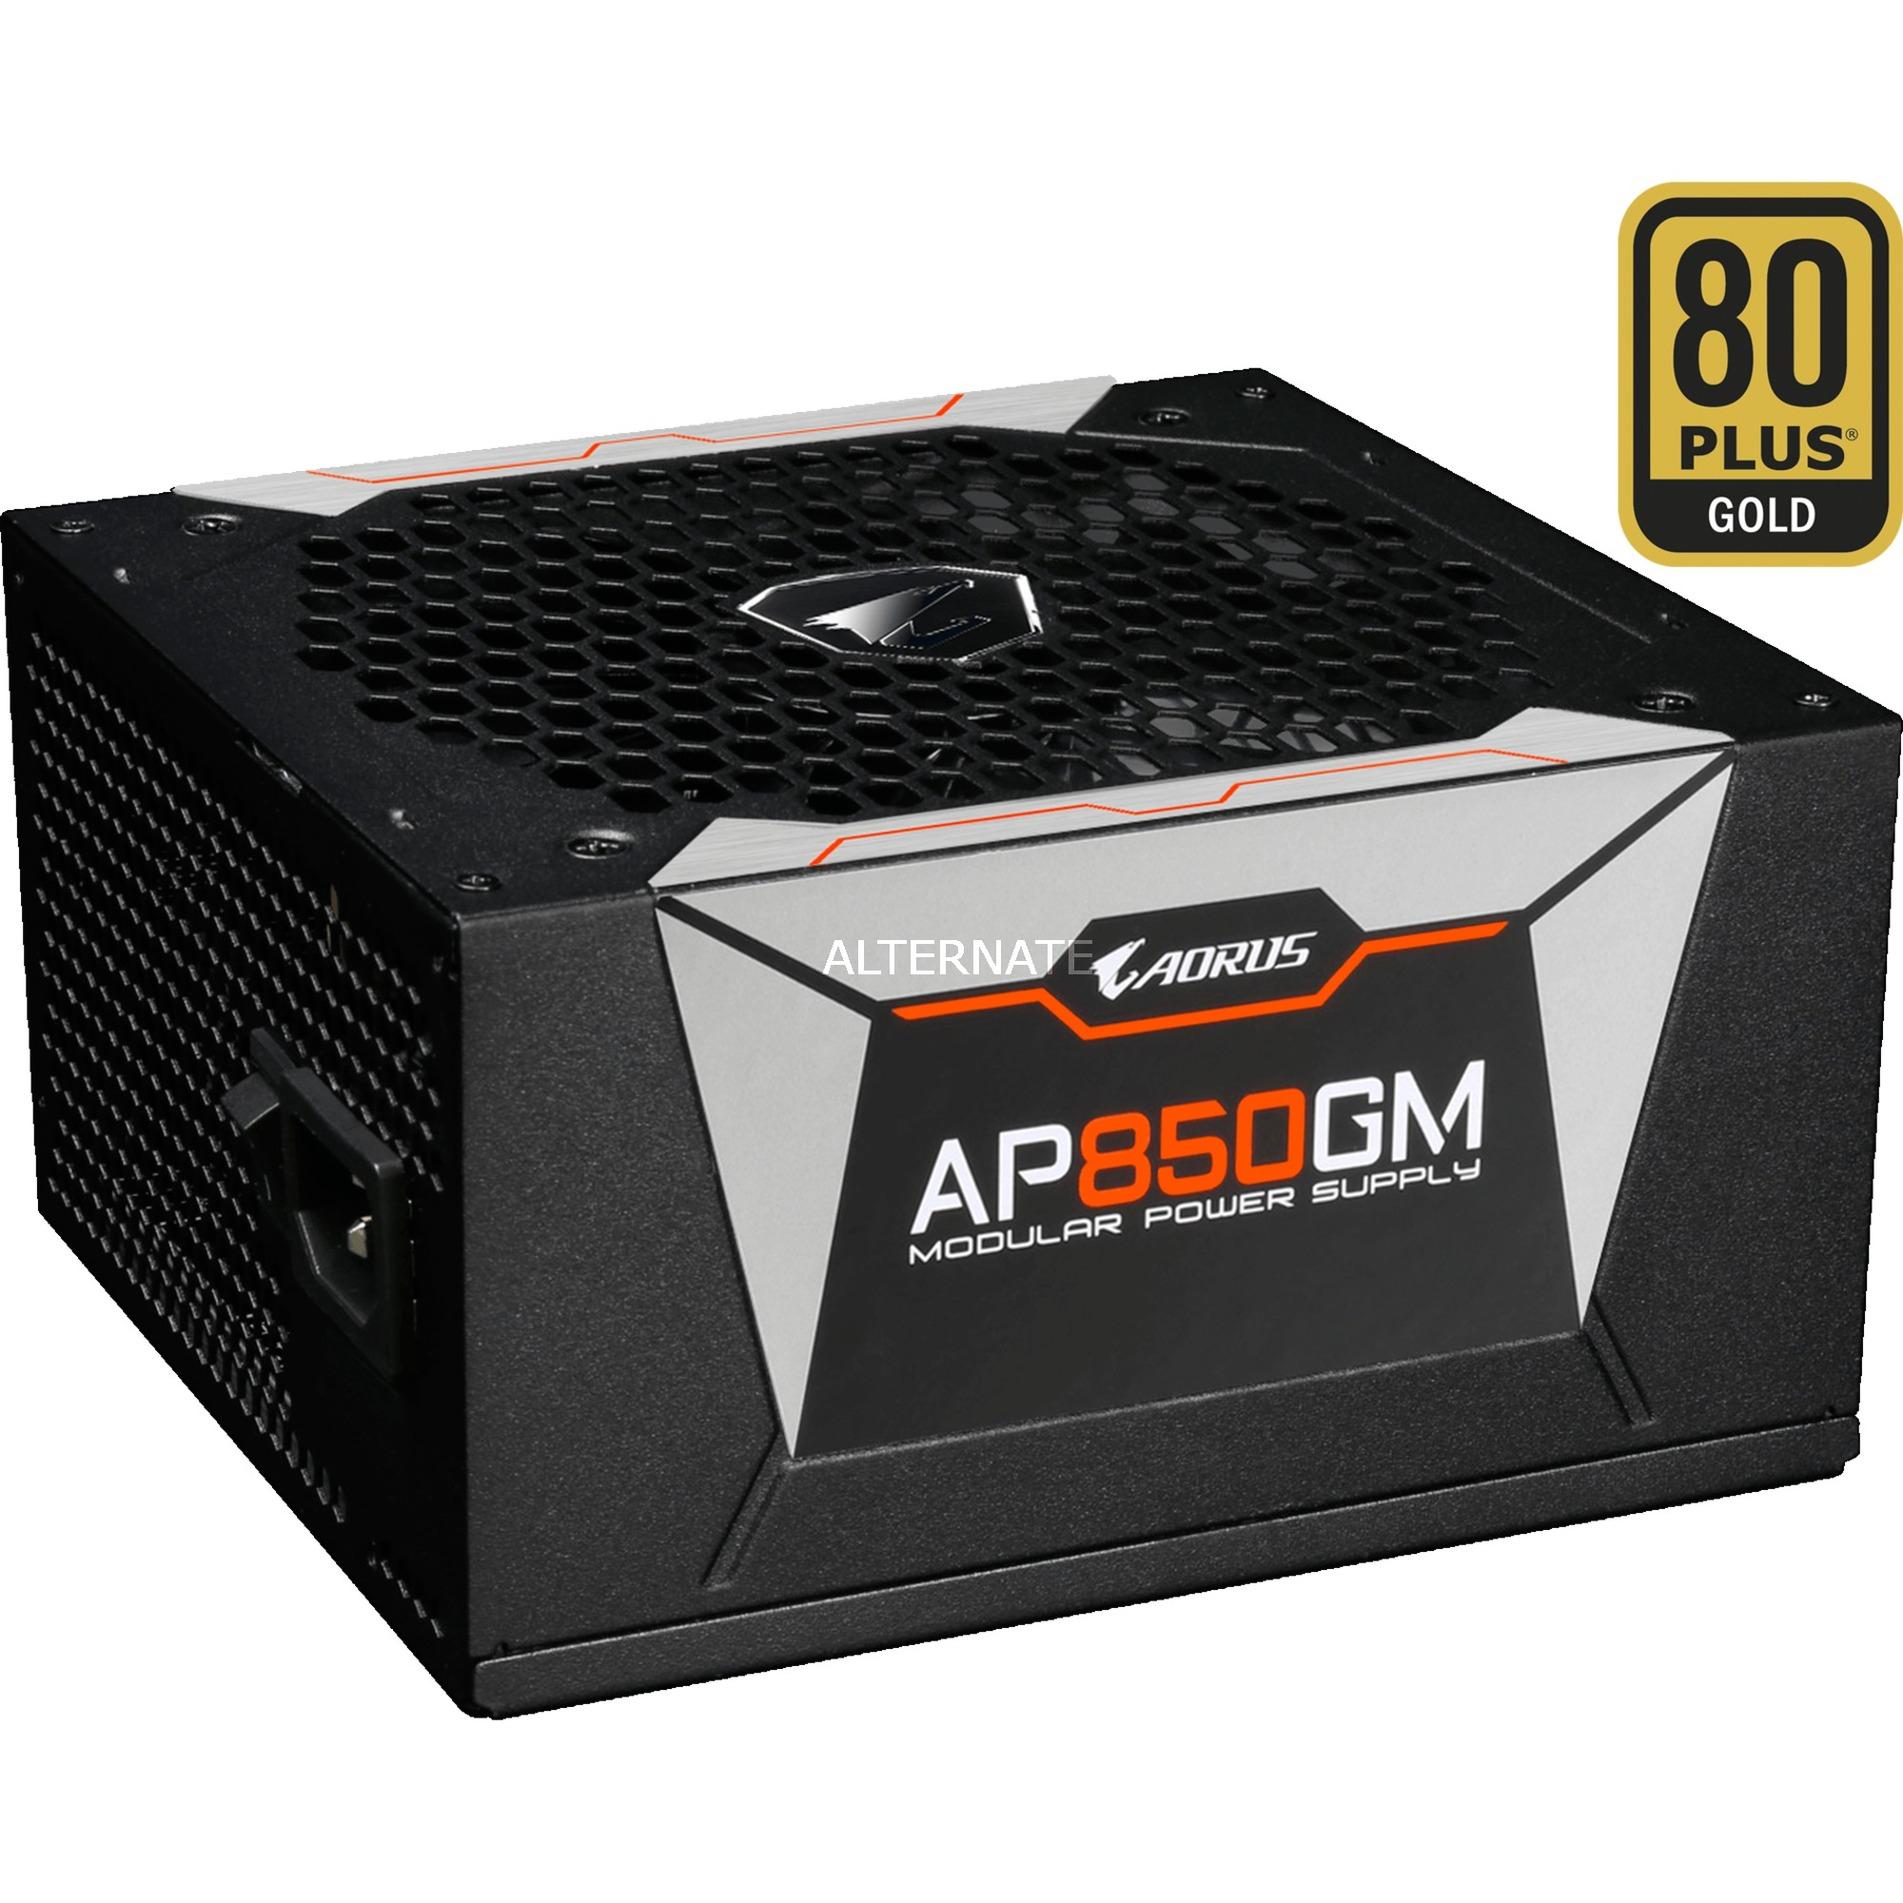 Alimentation PC modulaire Gigabyte Aorus AP850GM - 80+ Gold, 850 W